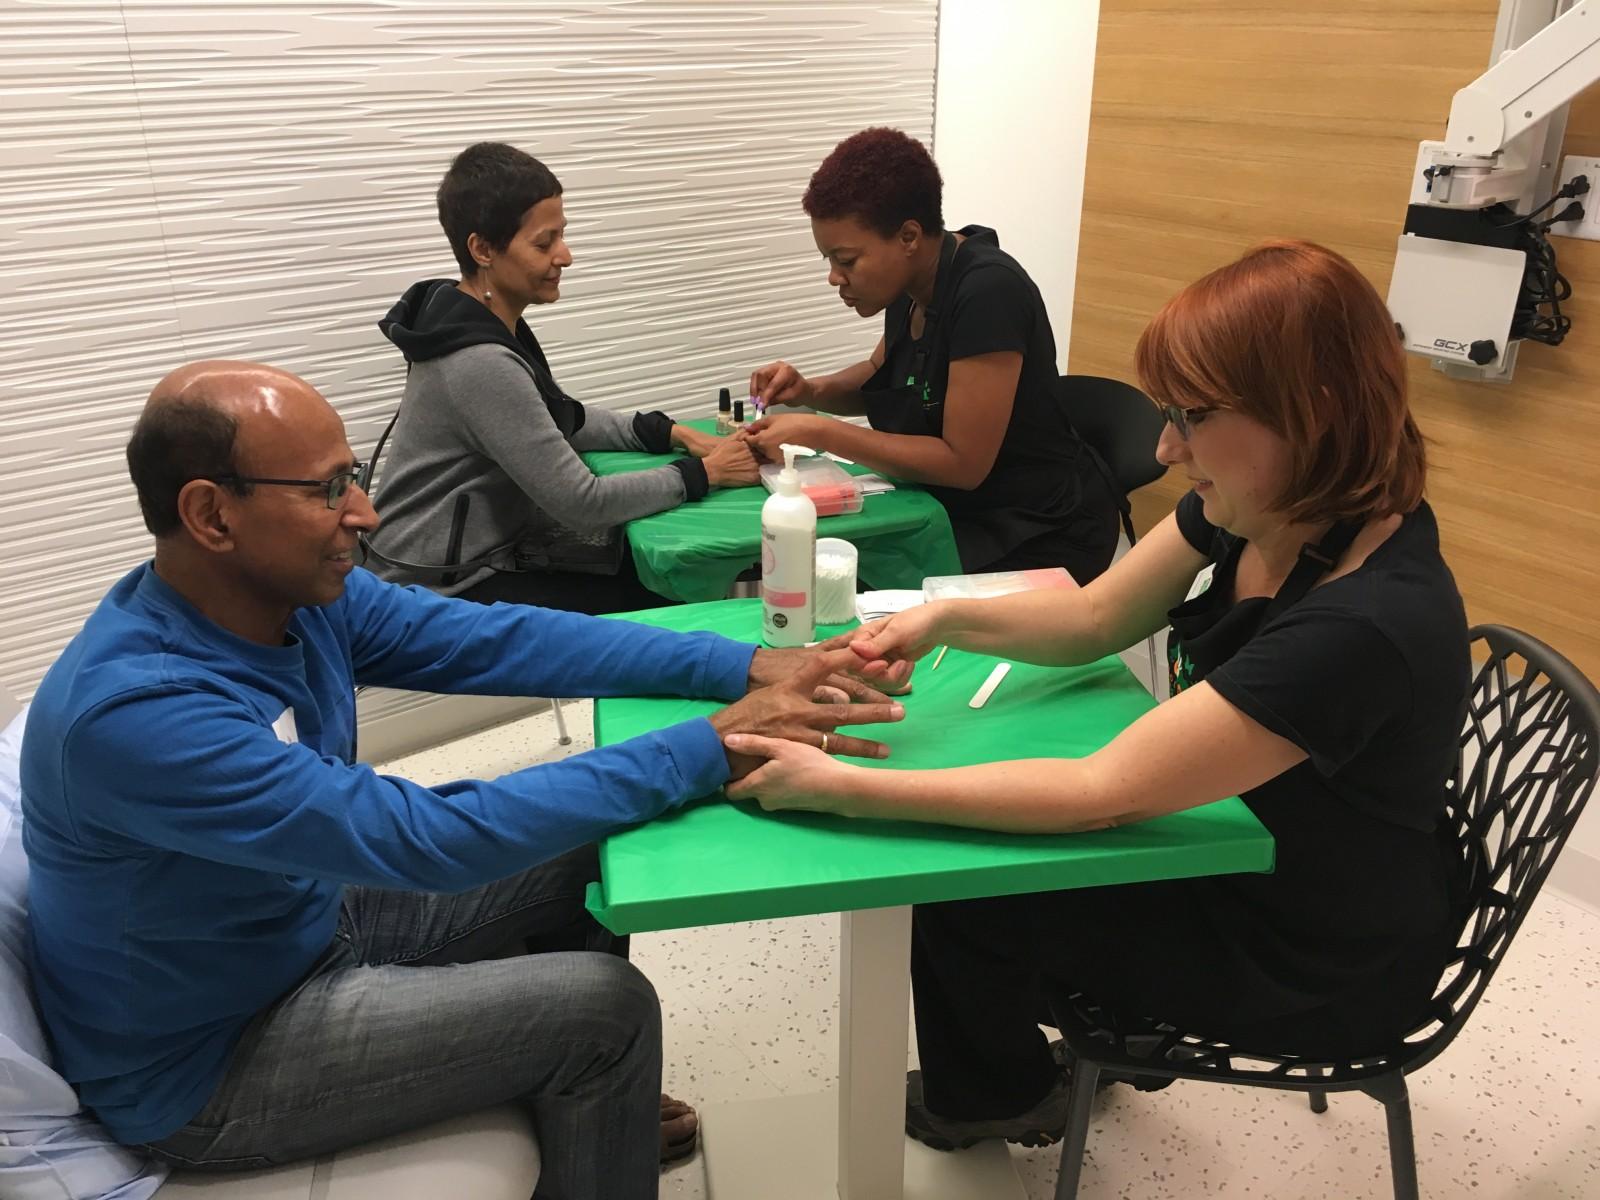 KABC, KNBC, Telemundo: Beauty Bus Pampers Patients and